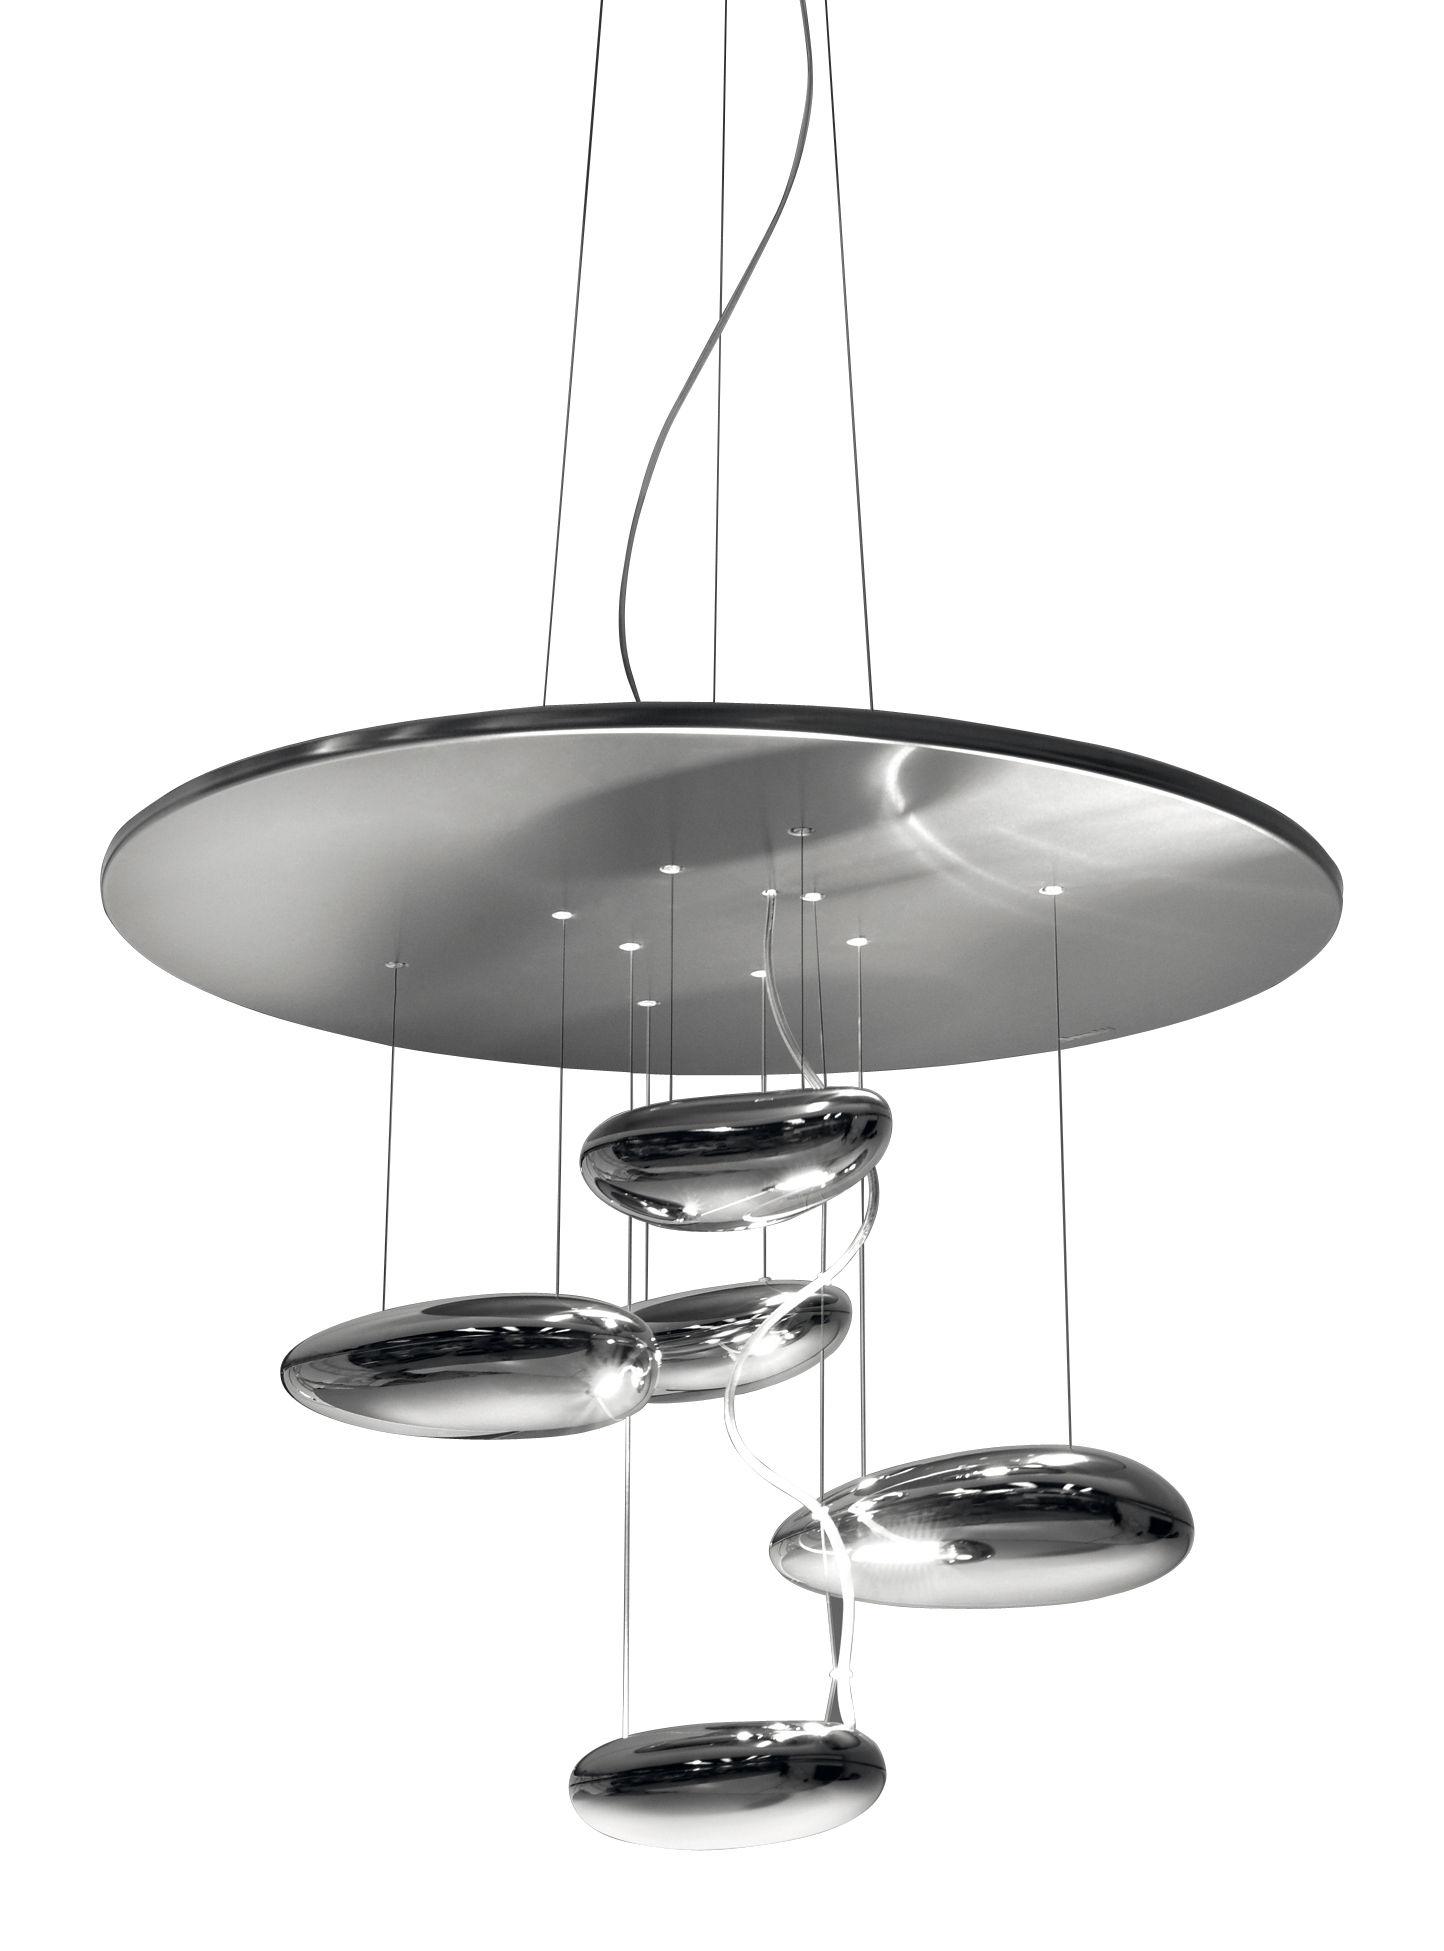 Lighting - Ceiling Lights - Mercury mini Ceiling light - LED by Artemide - Metal grey & mirror - Aluminium, Stainless steel